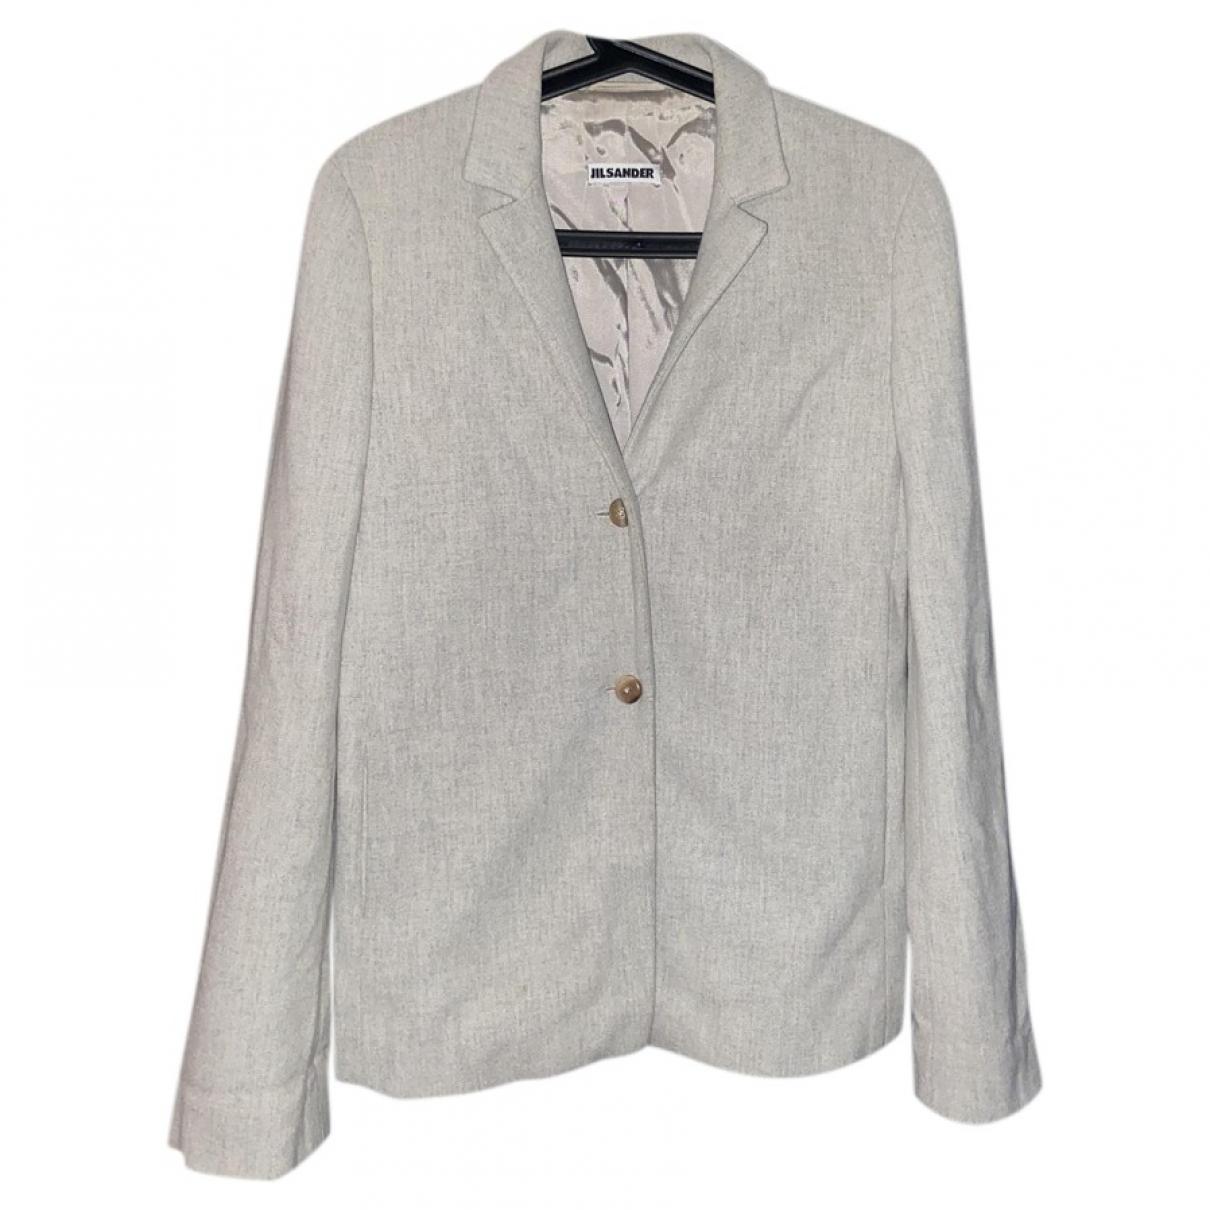 Jil Sander N Grey Cashmere jacket for Women 36 IT